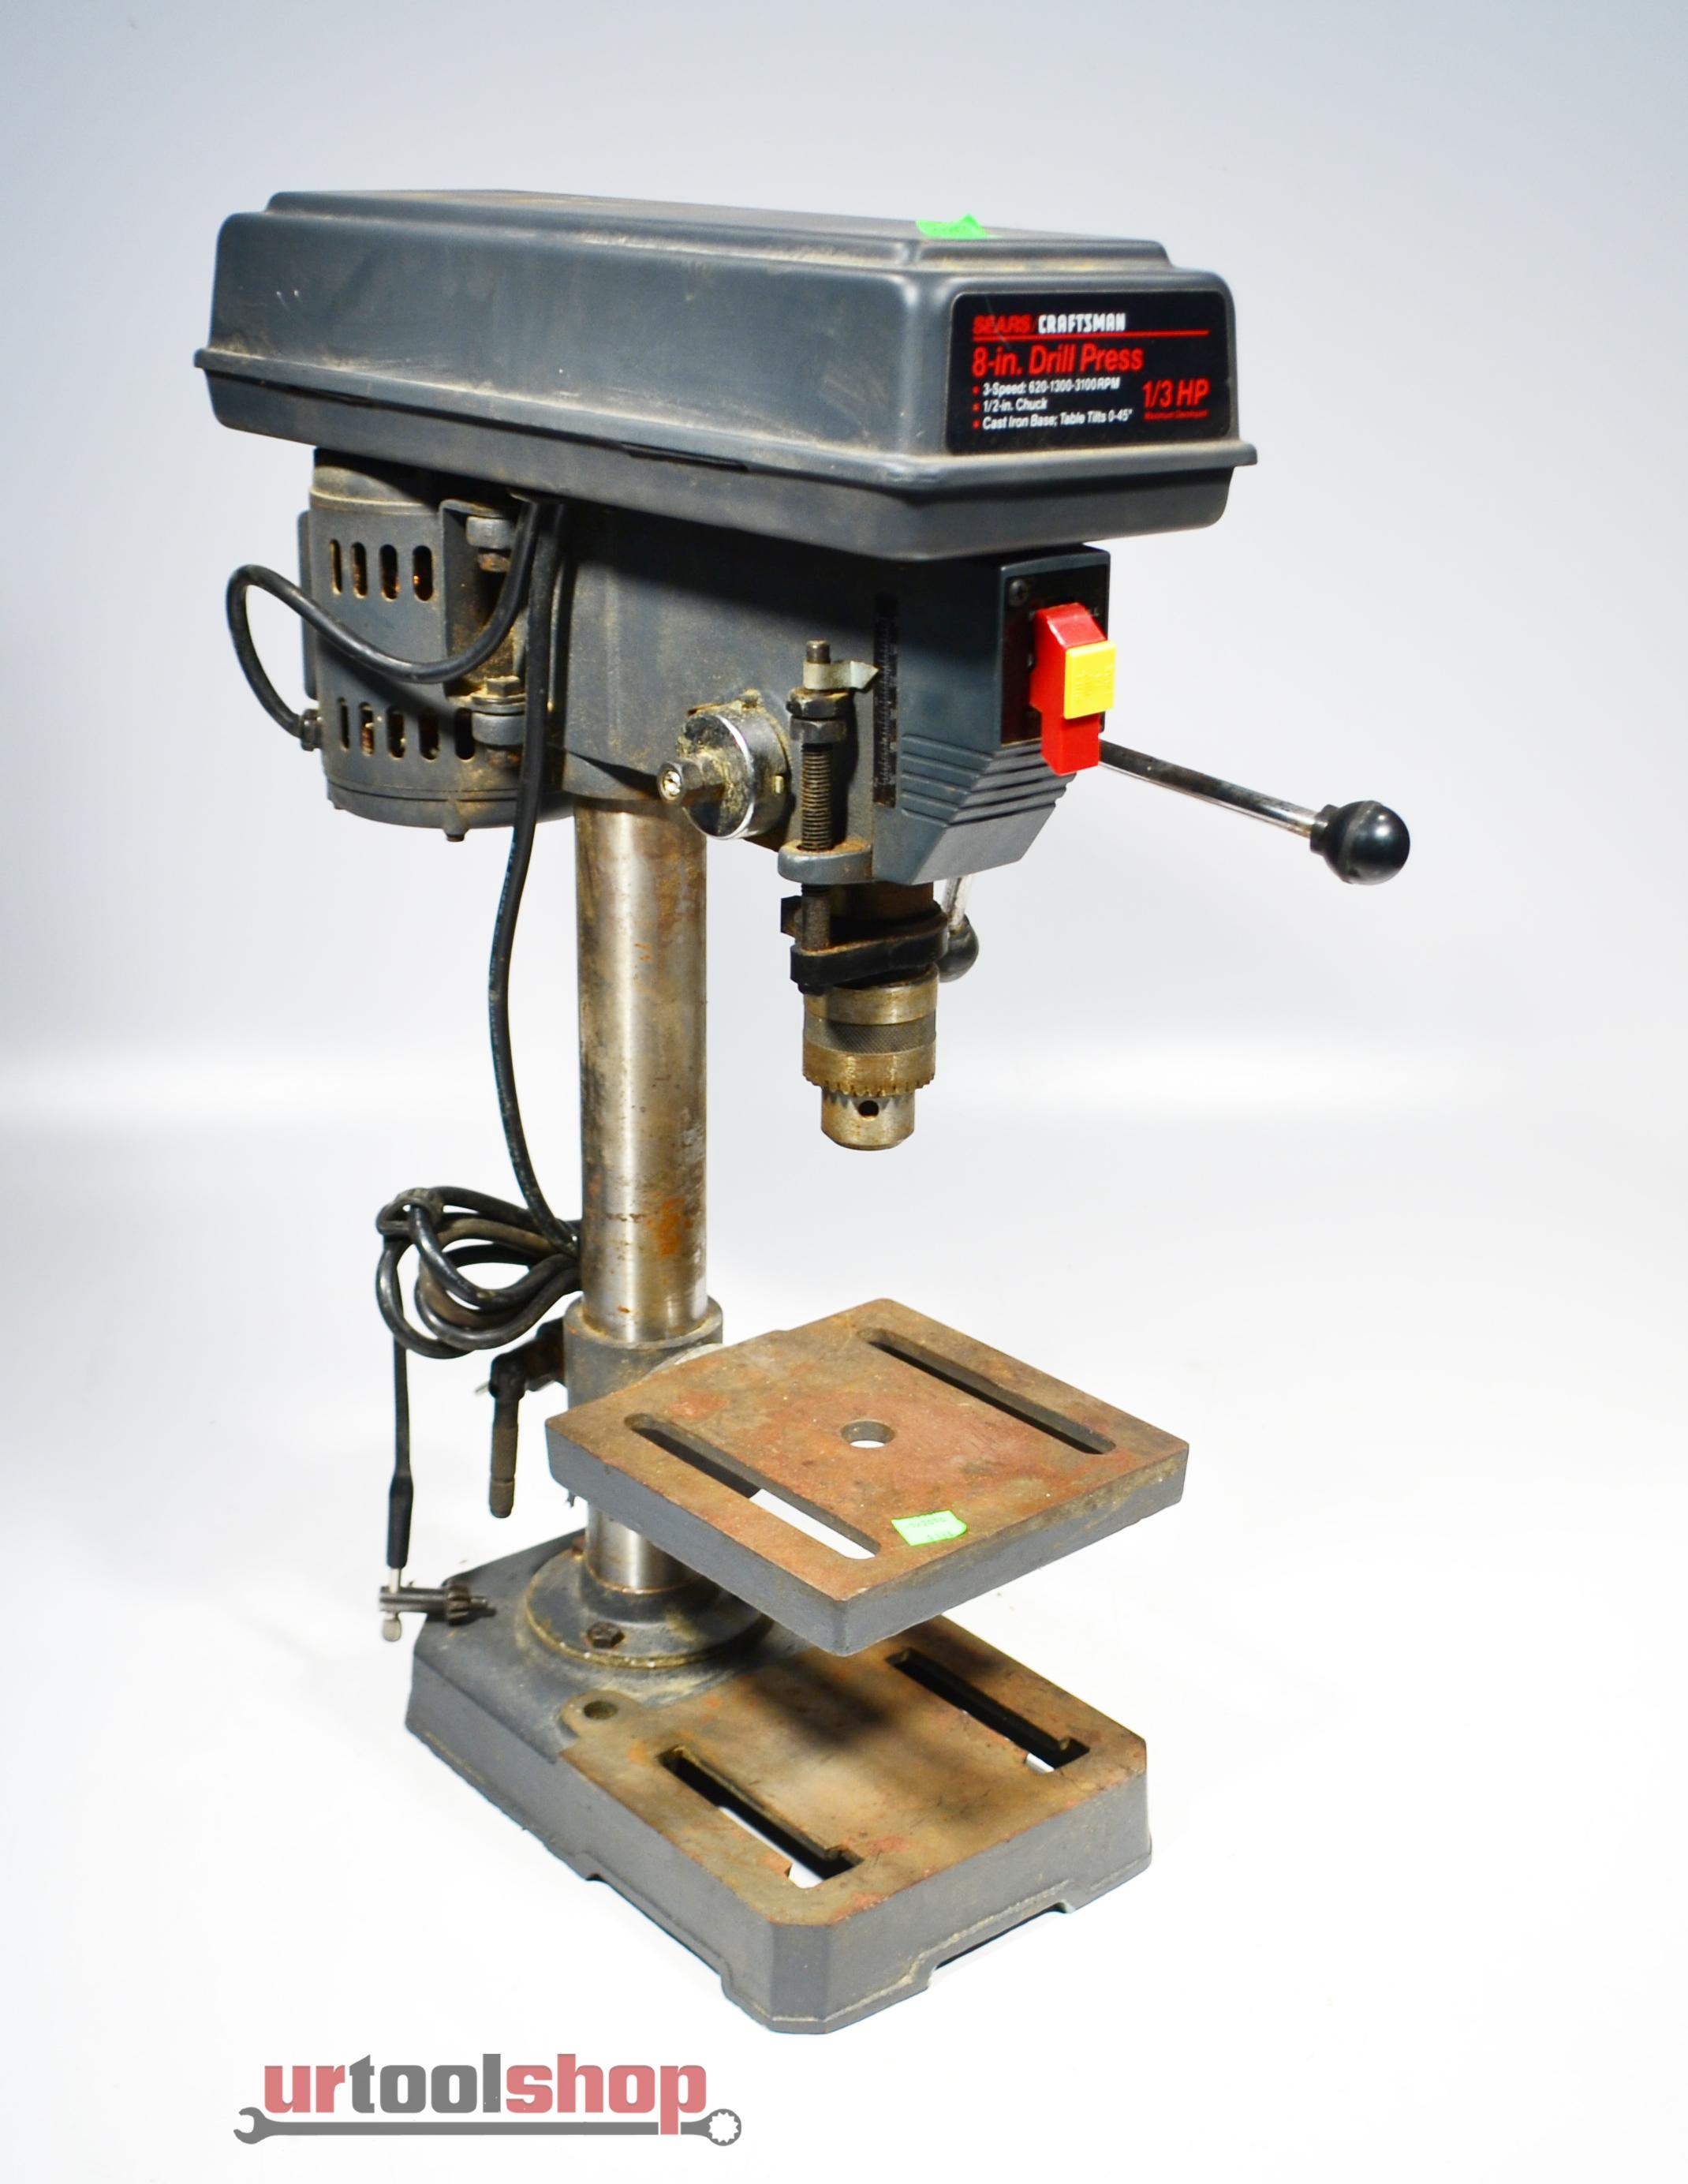 craftsman 8 in 1 3hp 3 speed bench drill press 1333 41 ebay